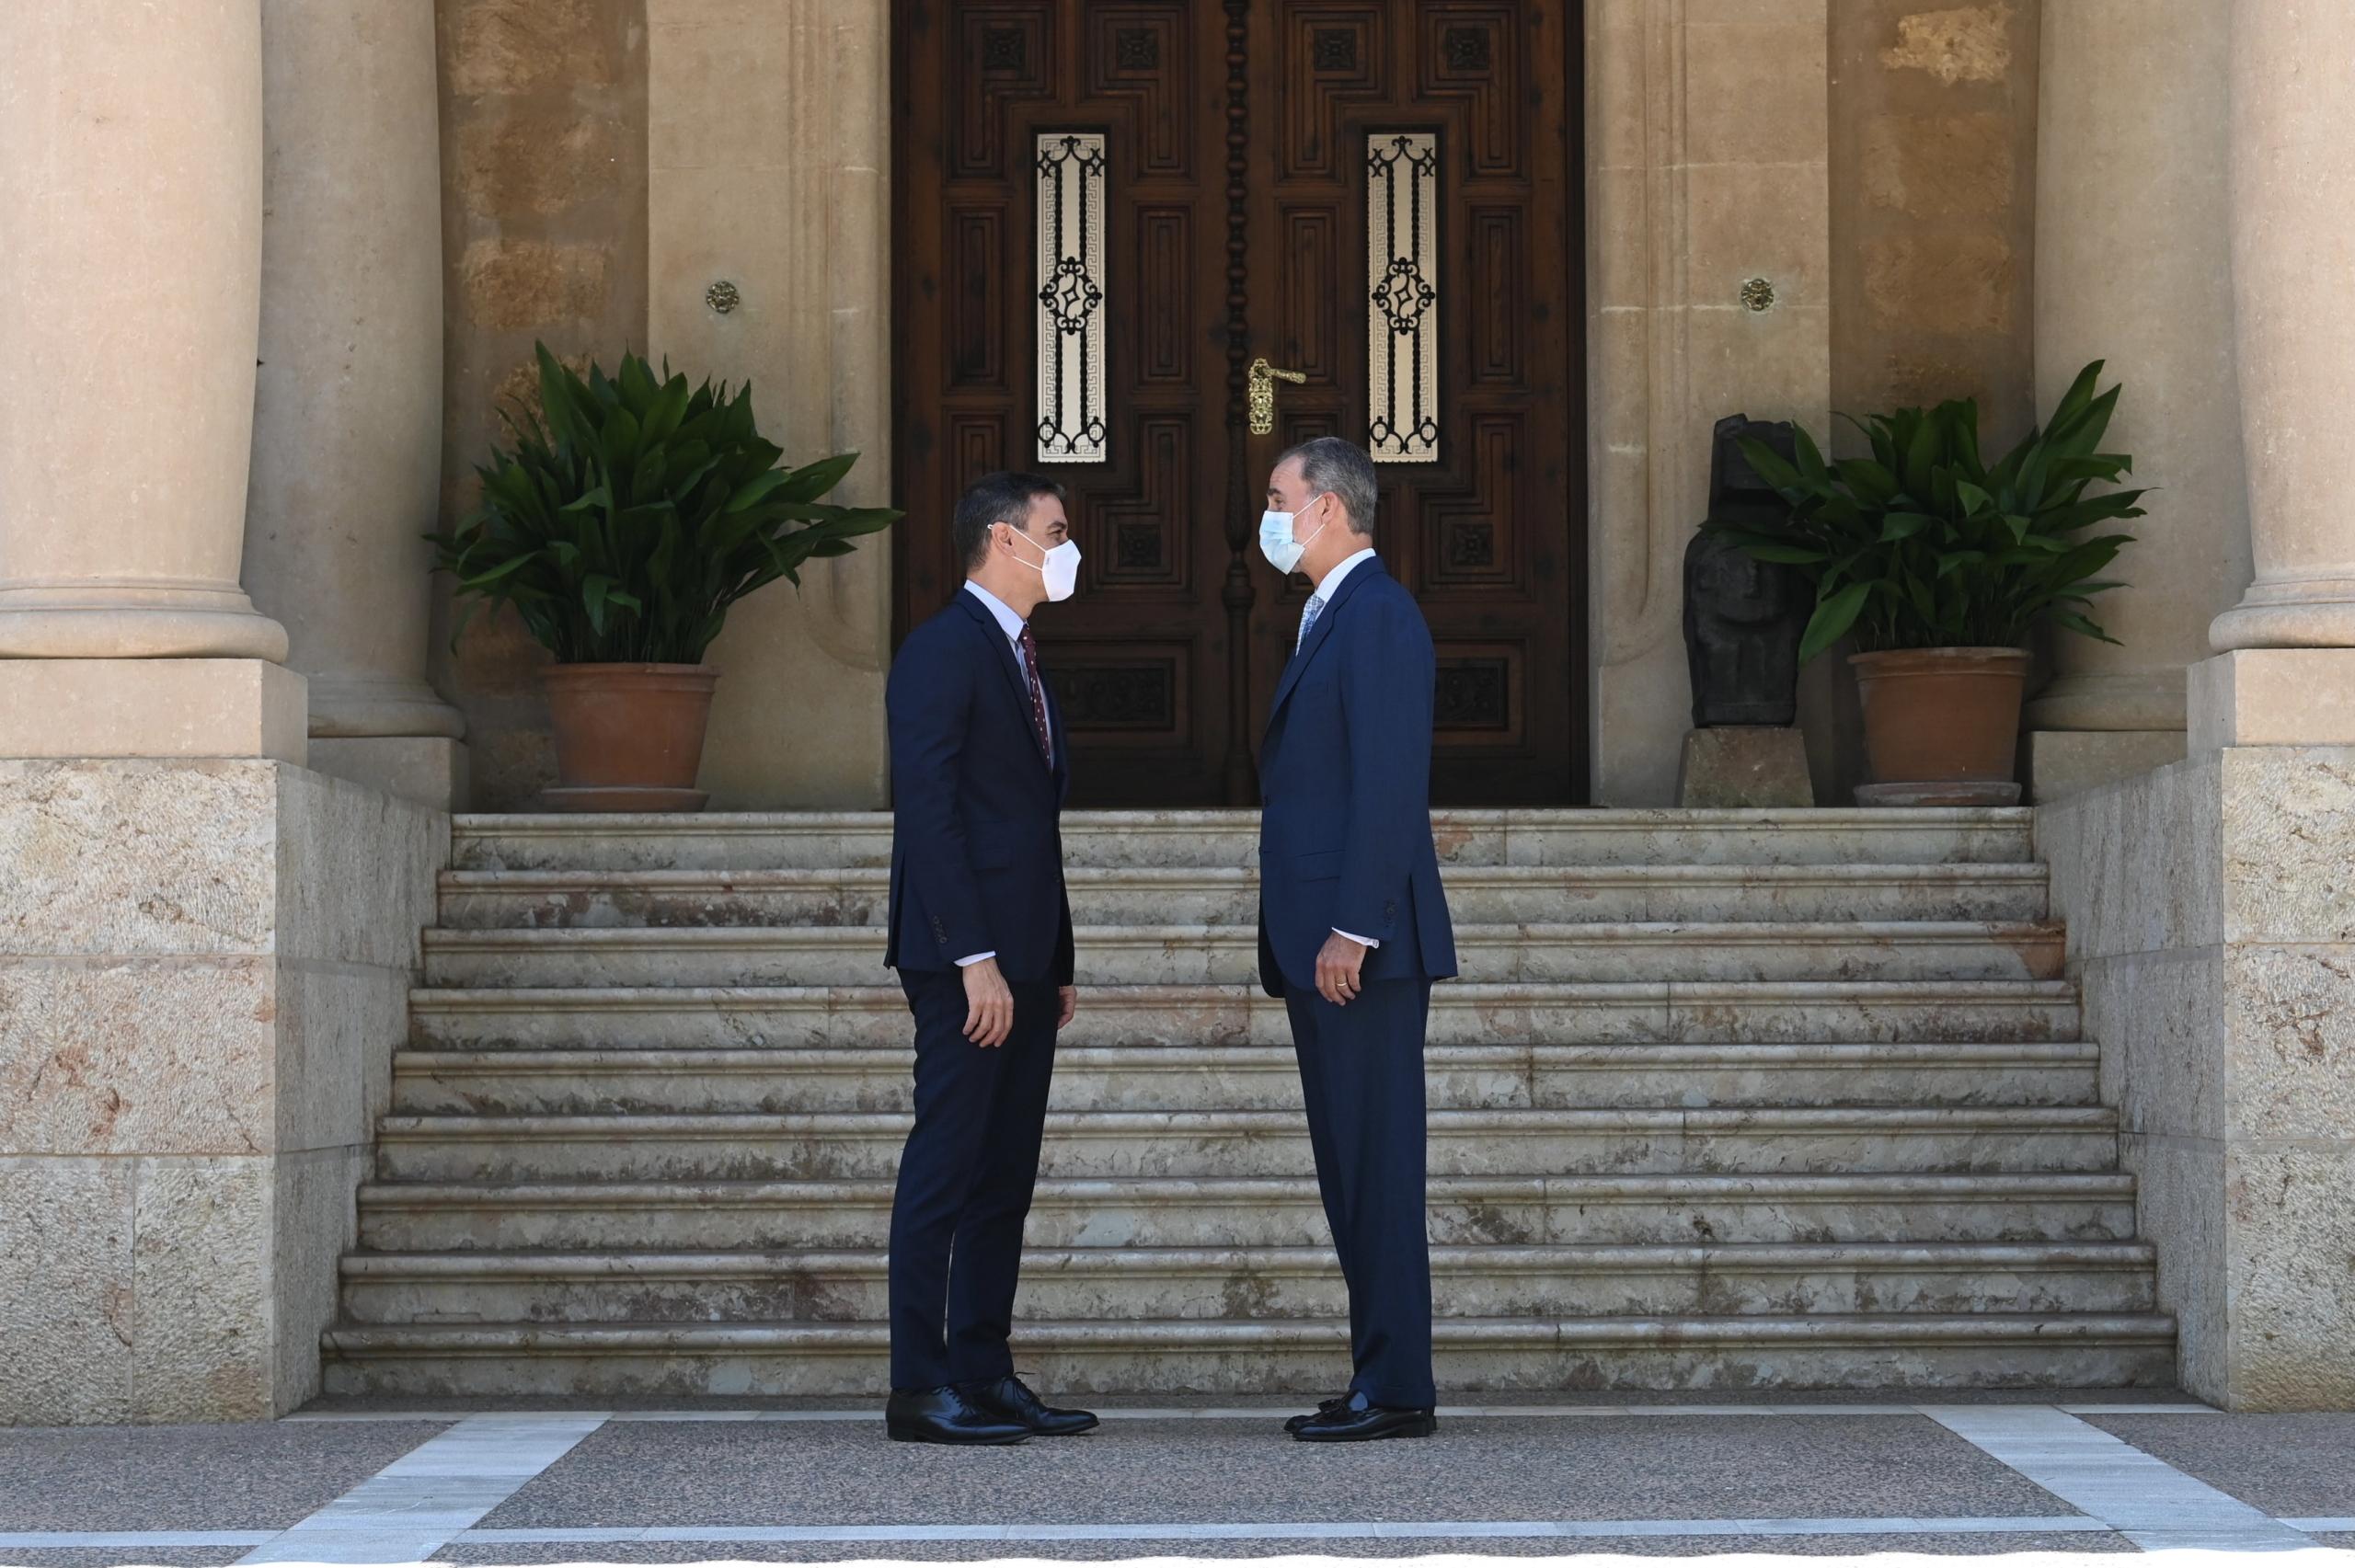 El rei Felip VI amb el president del govern espanyol, Pedro Sánchez, al Palau de Marivent   ACN